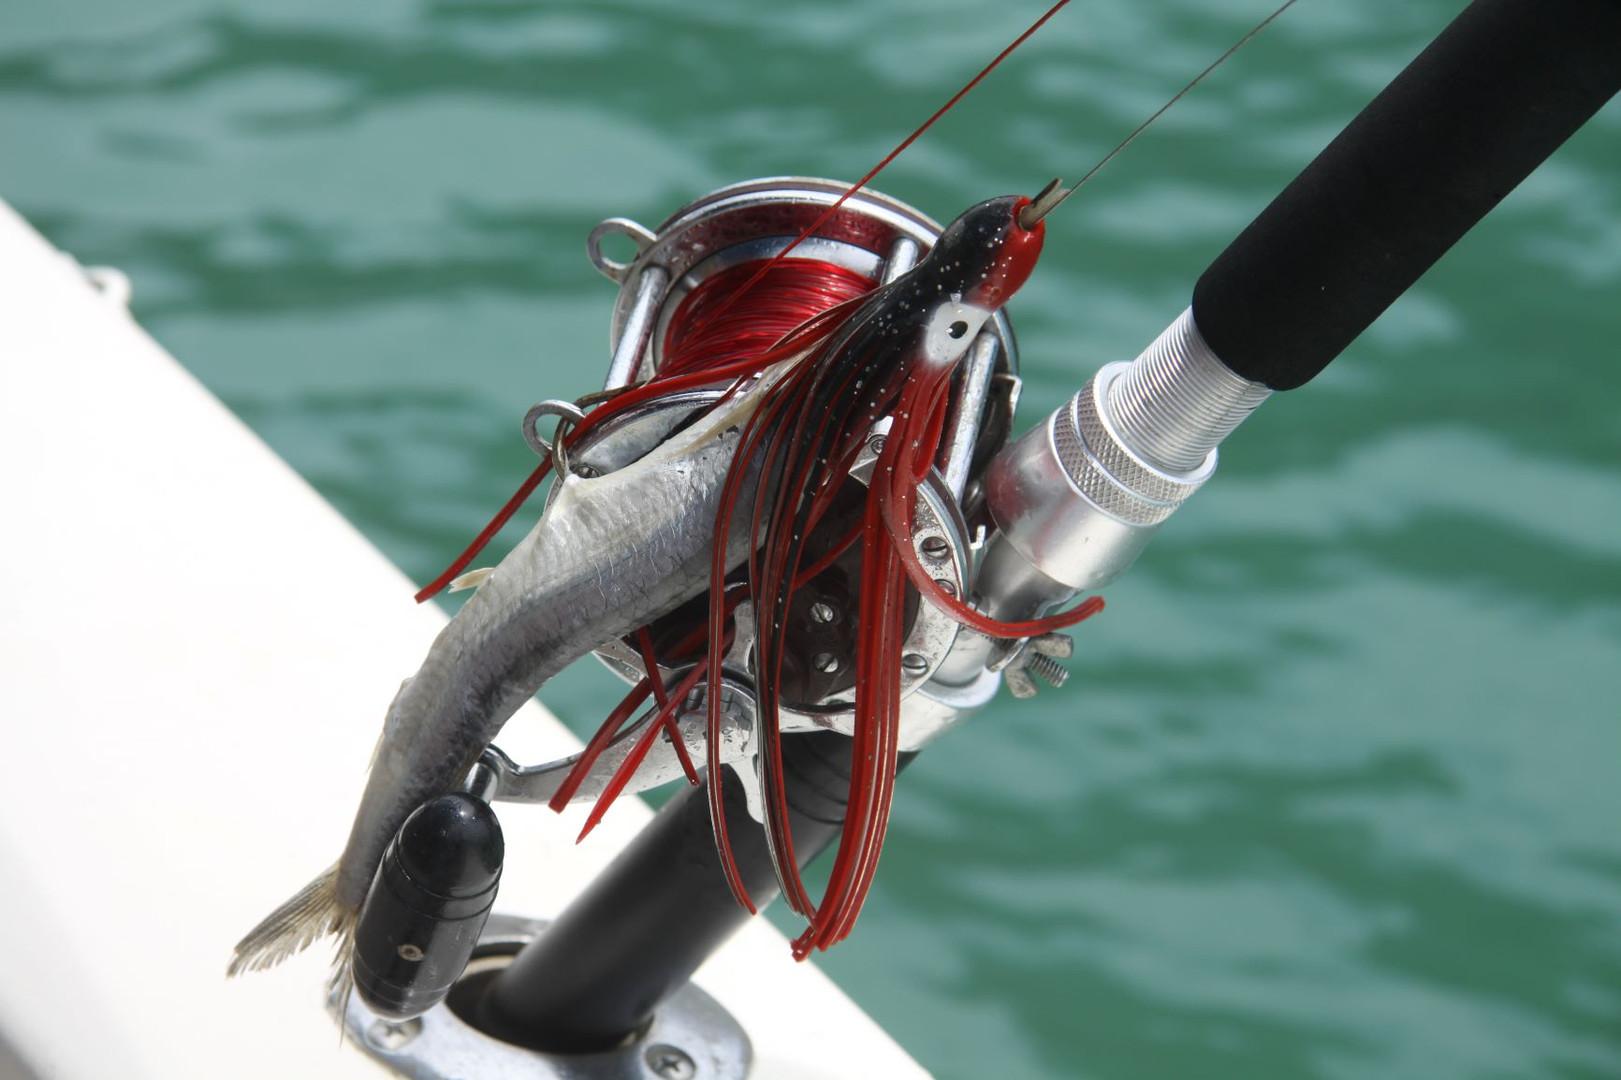 #019 fiskedrag, san juan del sur, nicaragua